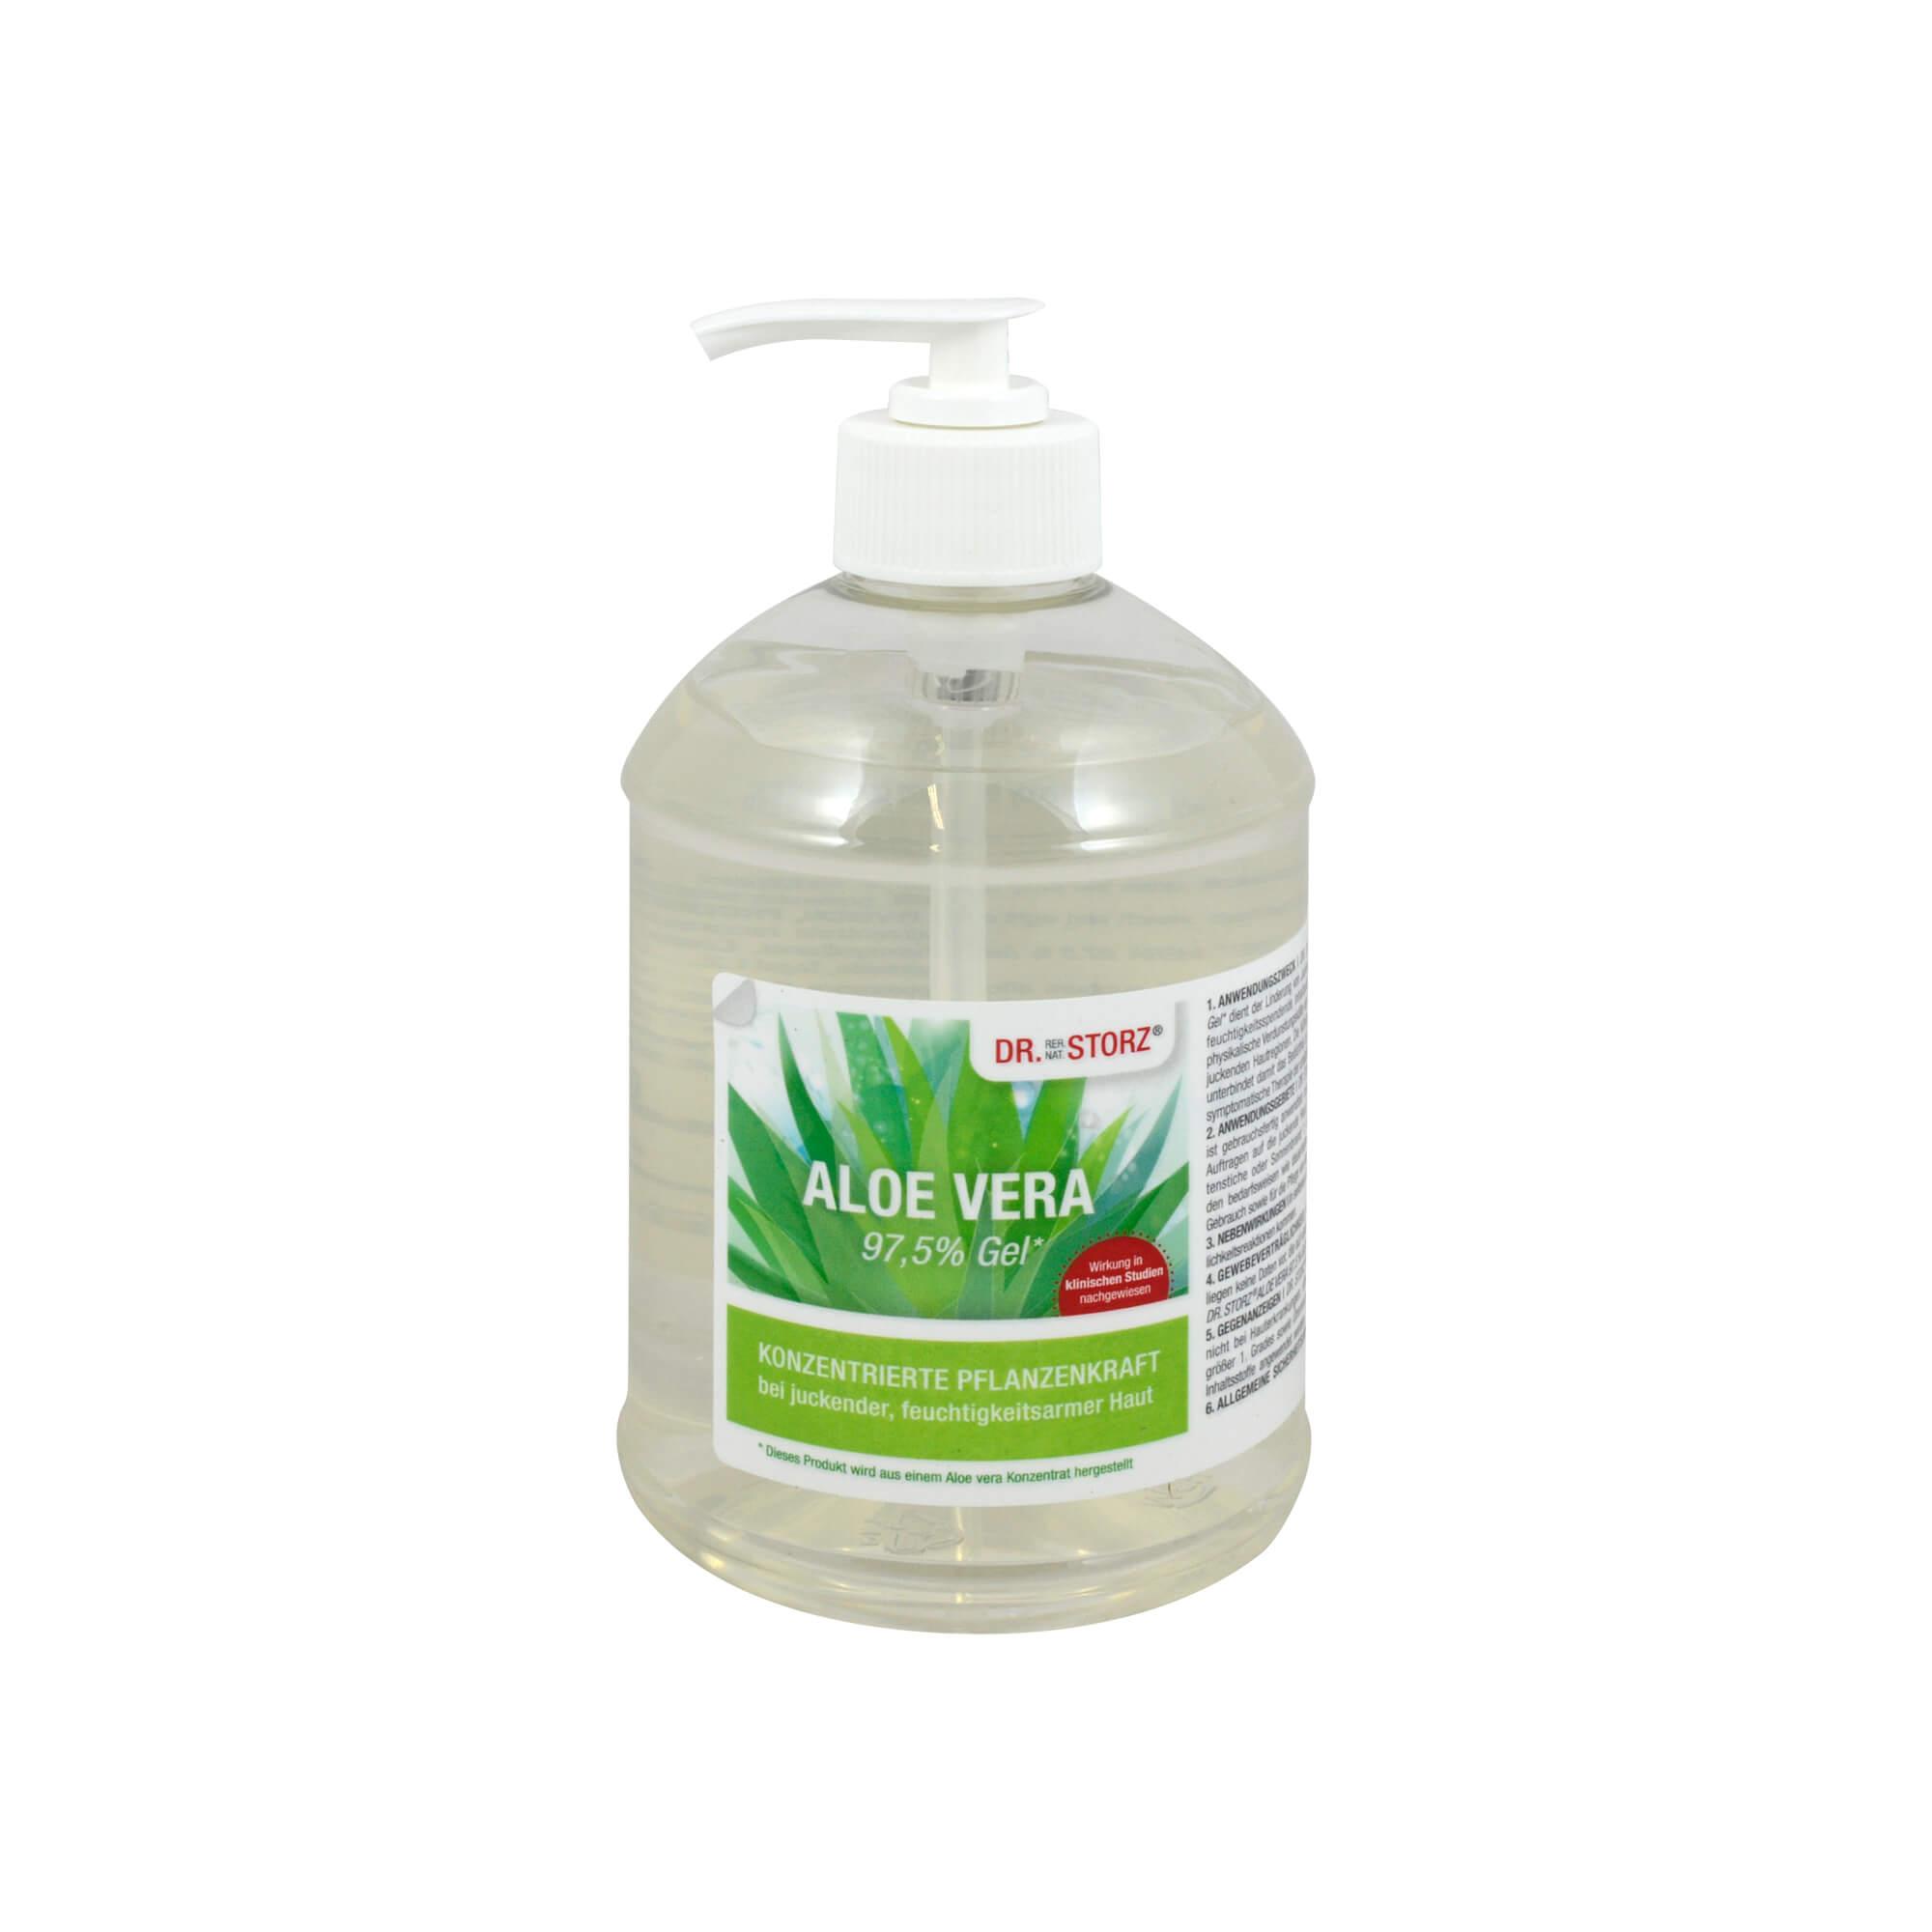 Aloe Vera Gel 97,5% Dr. Storz